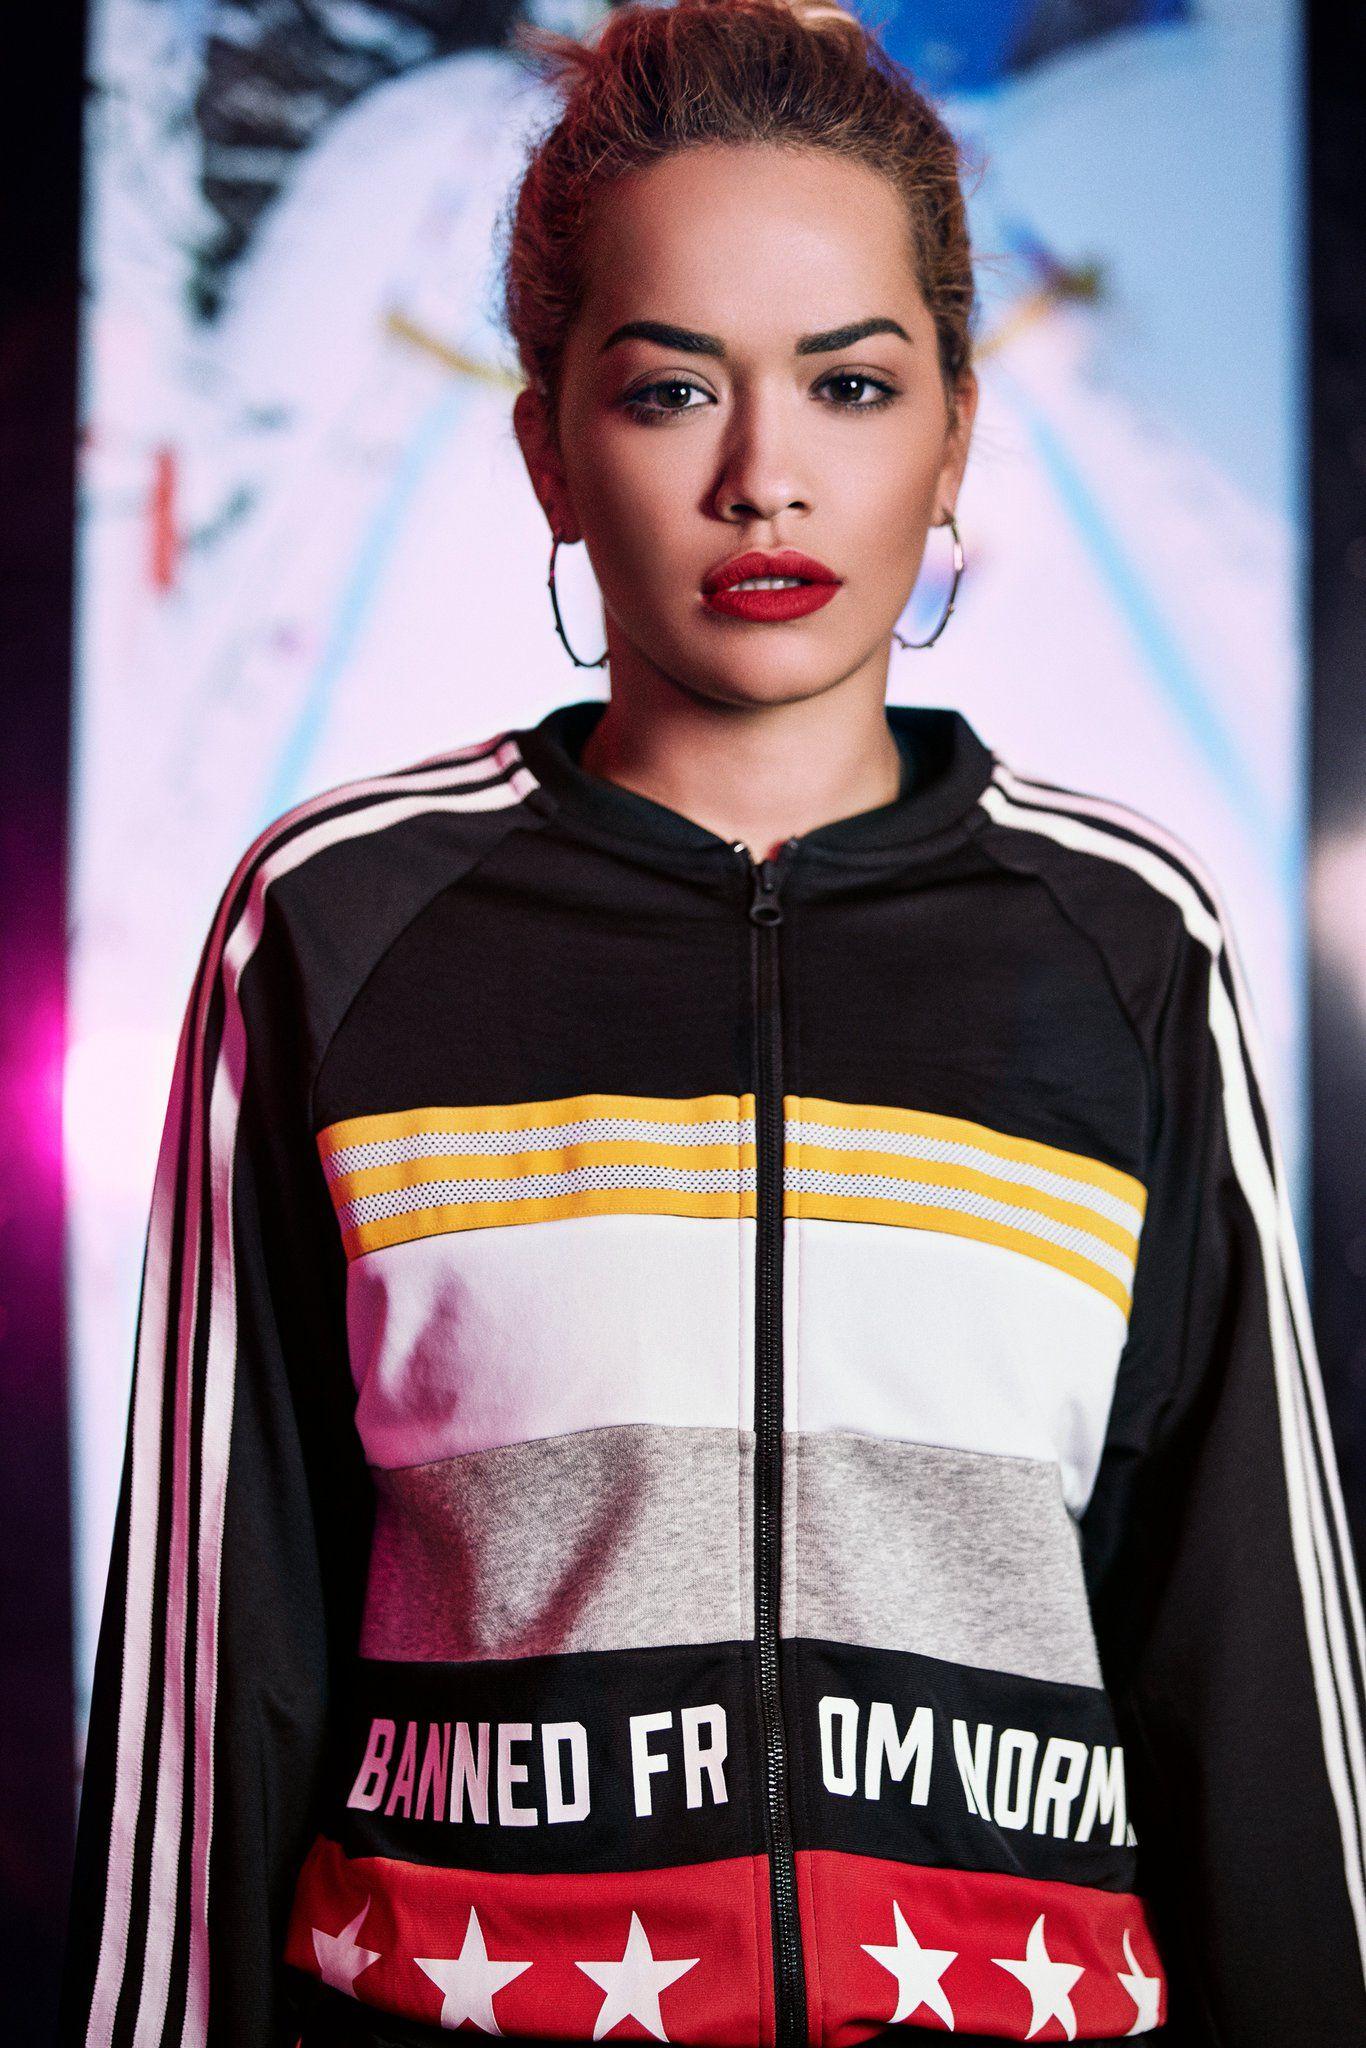 Rita Ora for Adidas | Rita ora adidas, Rita ora, Rita ora